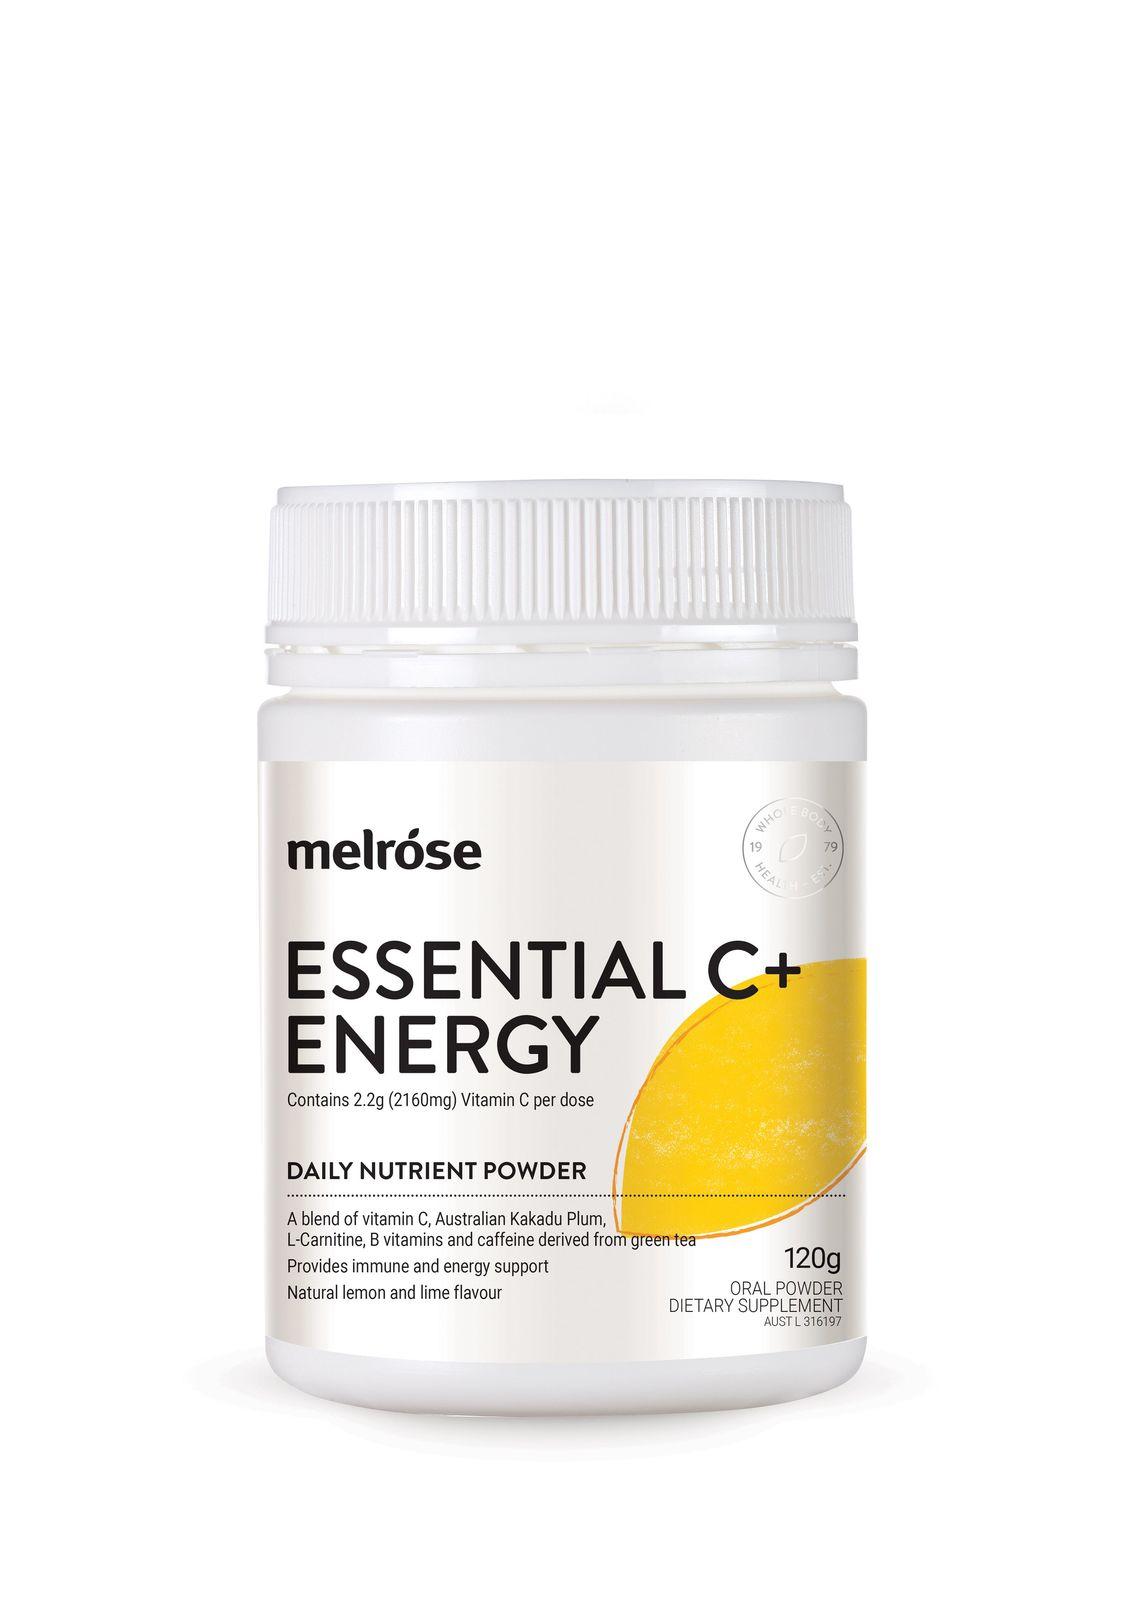 Melrose: Essential C + Energy (120g) image